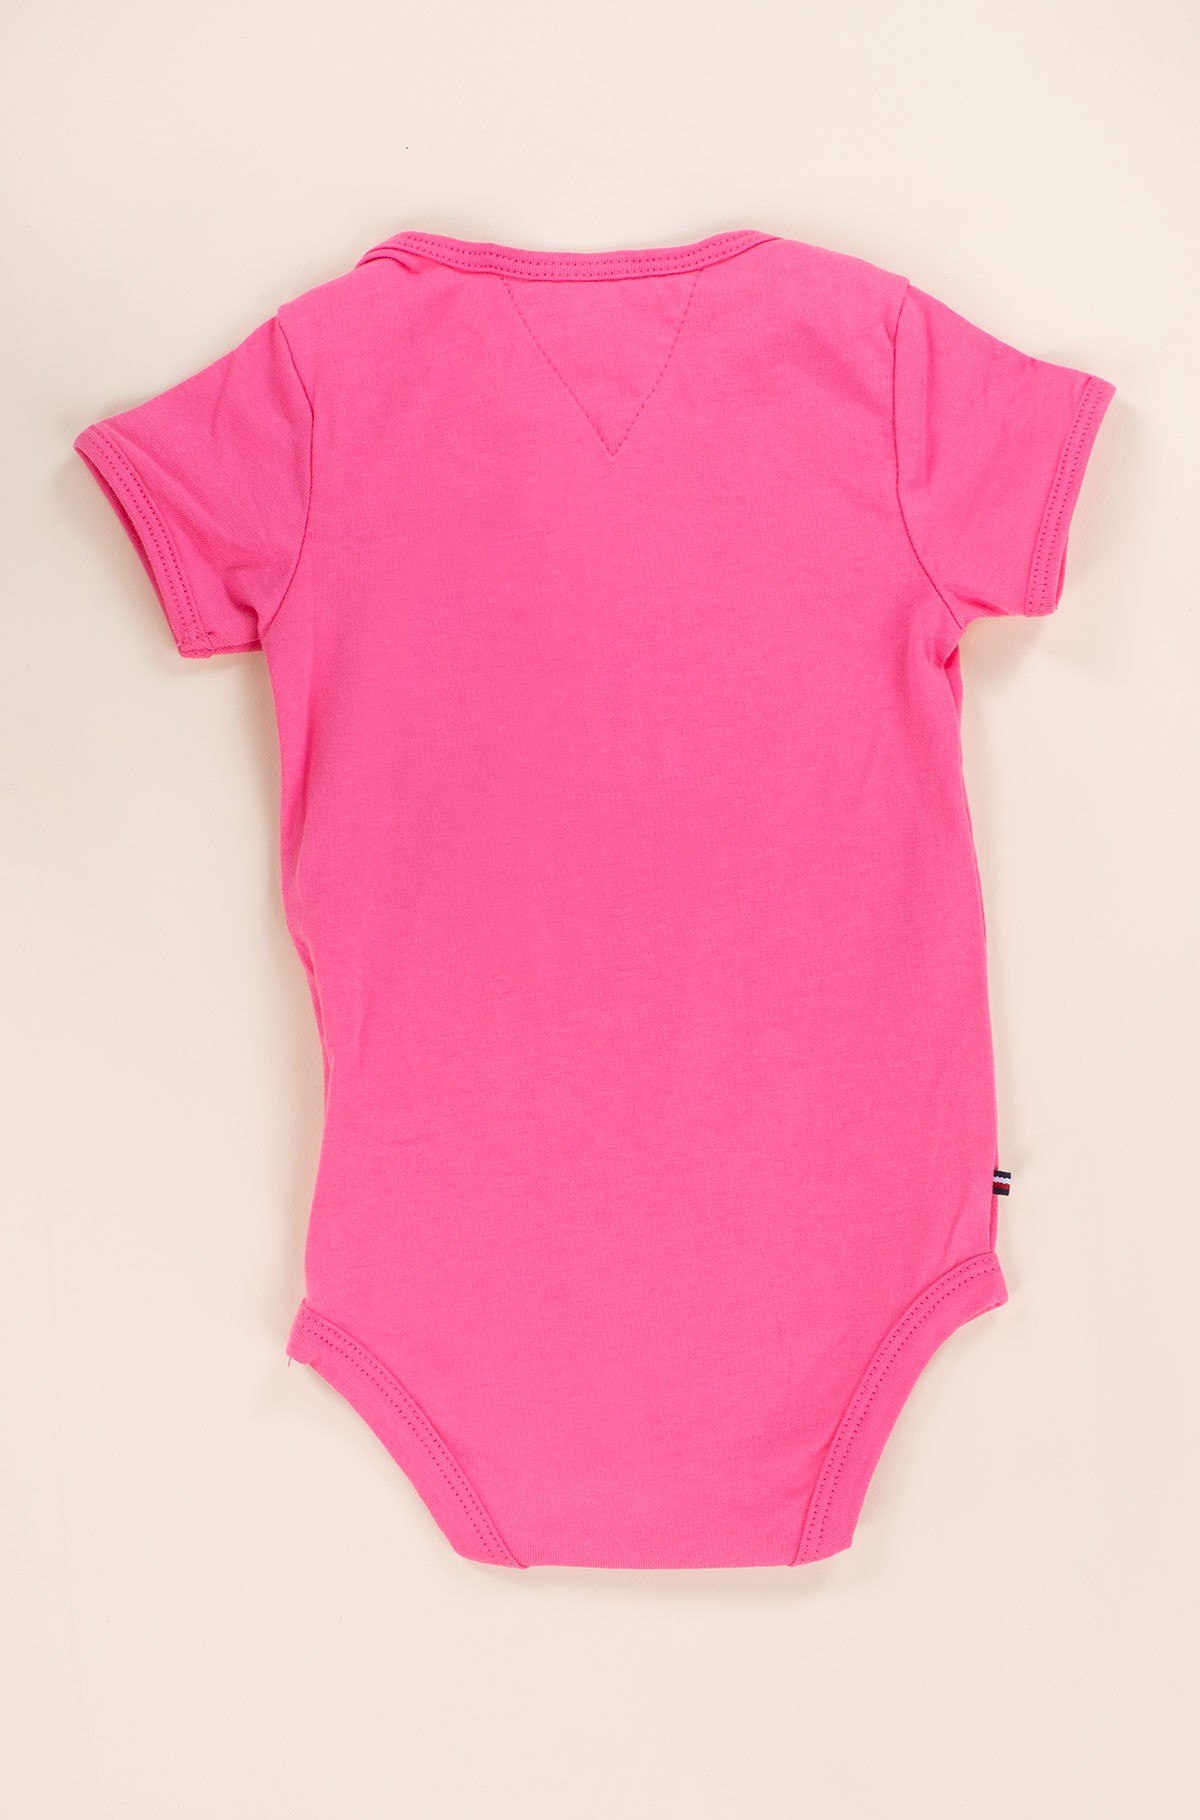 Bērnu bodī BABY ESTABLISHED BODY S/S-full-2